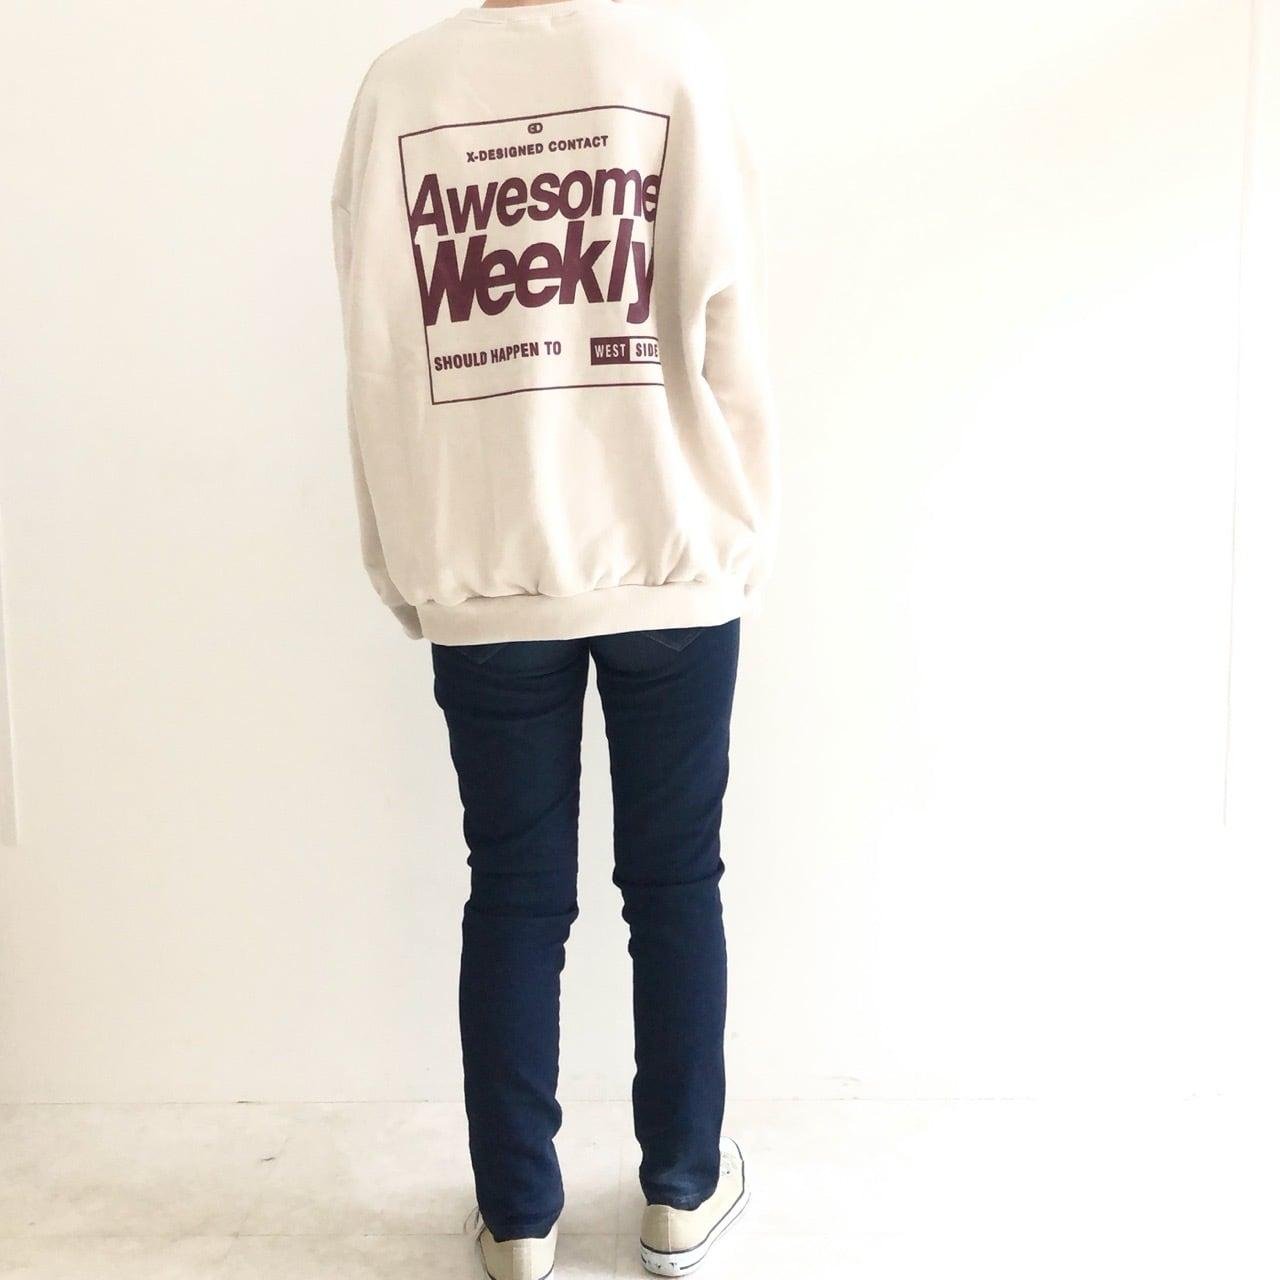 【 Days 】- 219-1001 - Weeklyロゴトレーナー